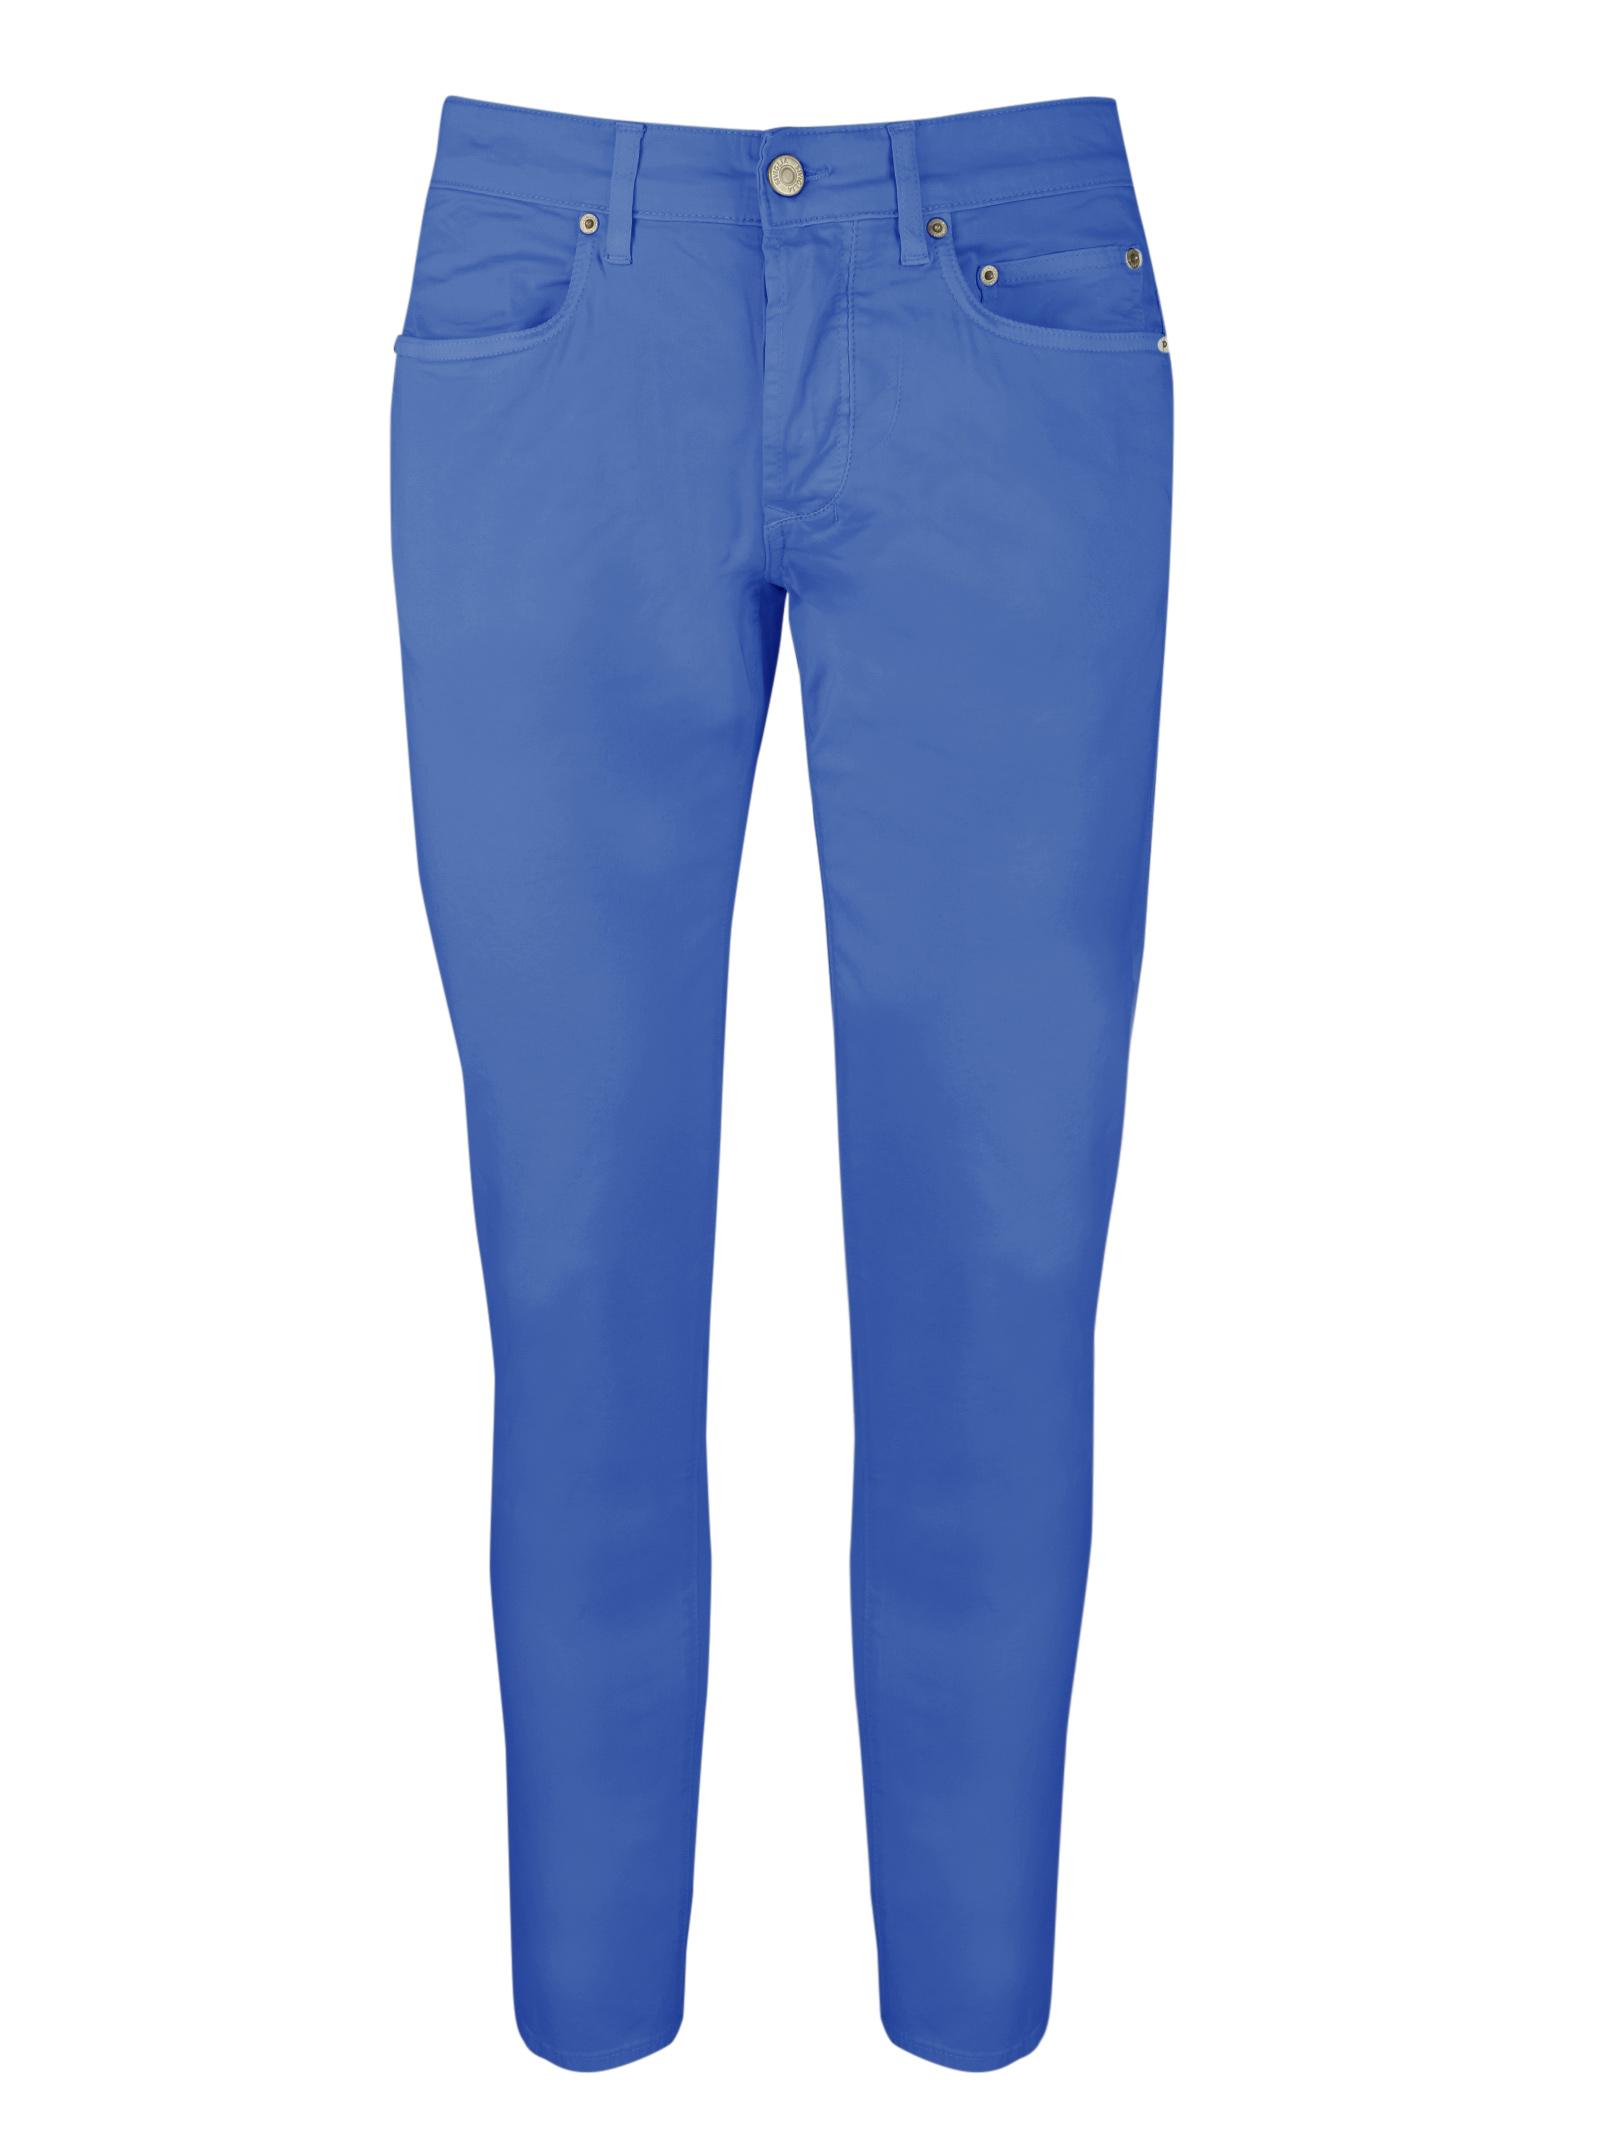 5 pocket light cotton pants SIVIGLIA | Trousers | MQ2001 80220622